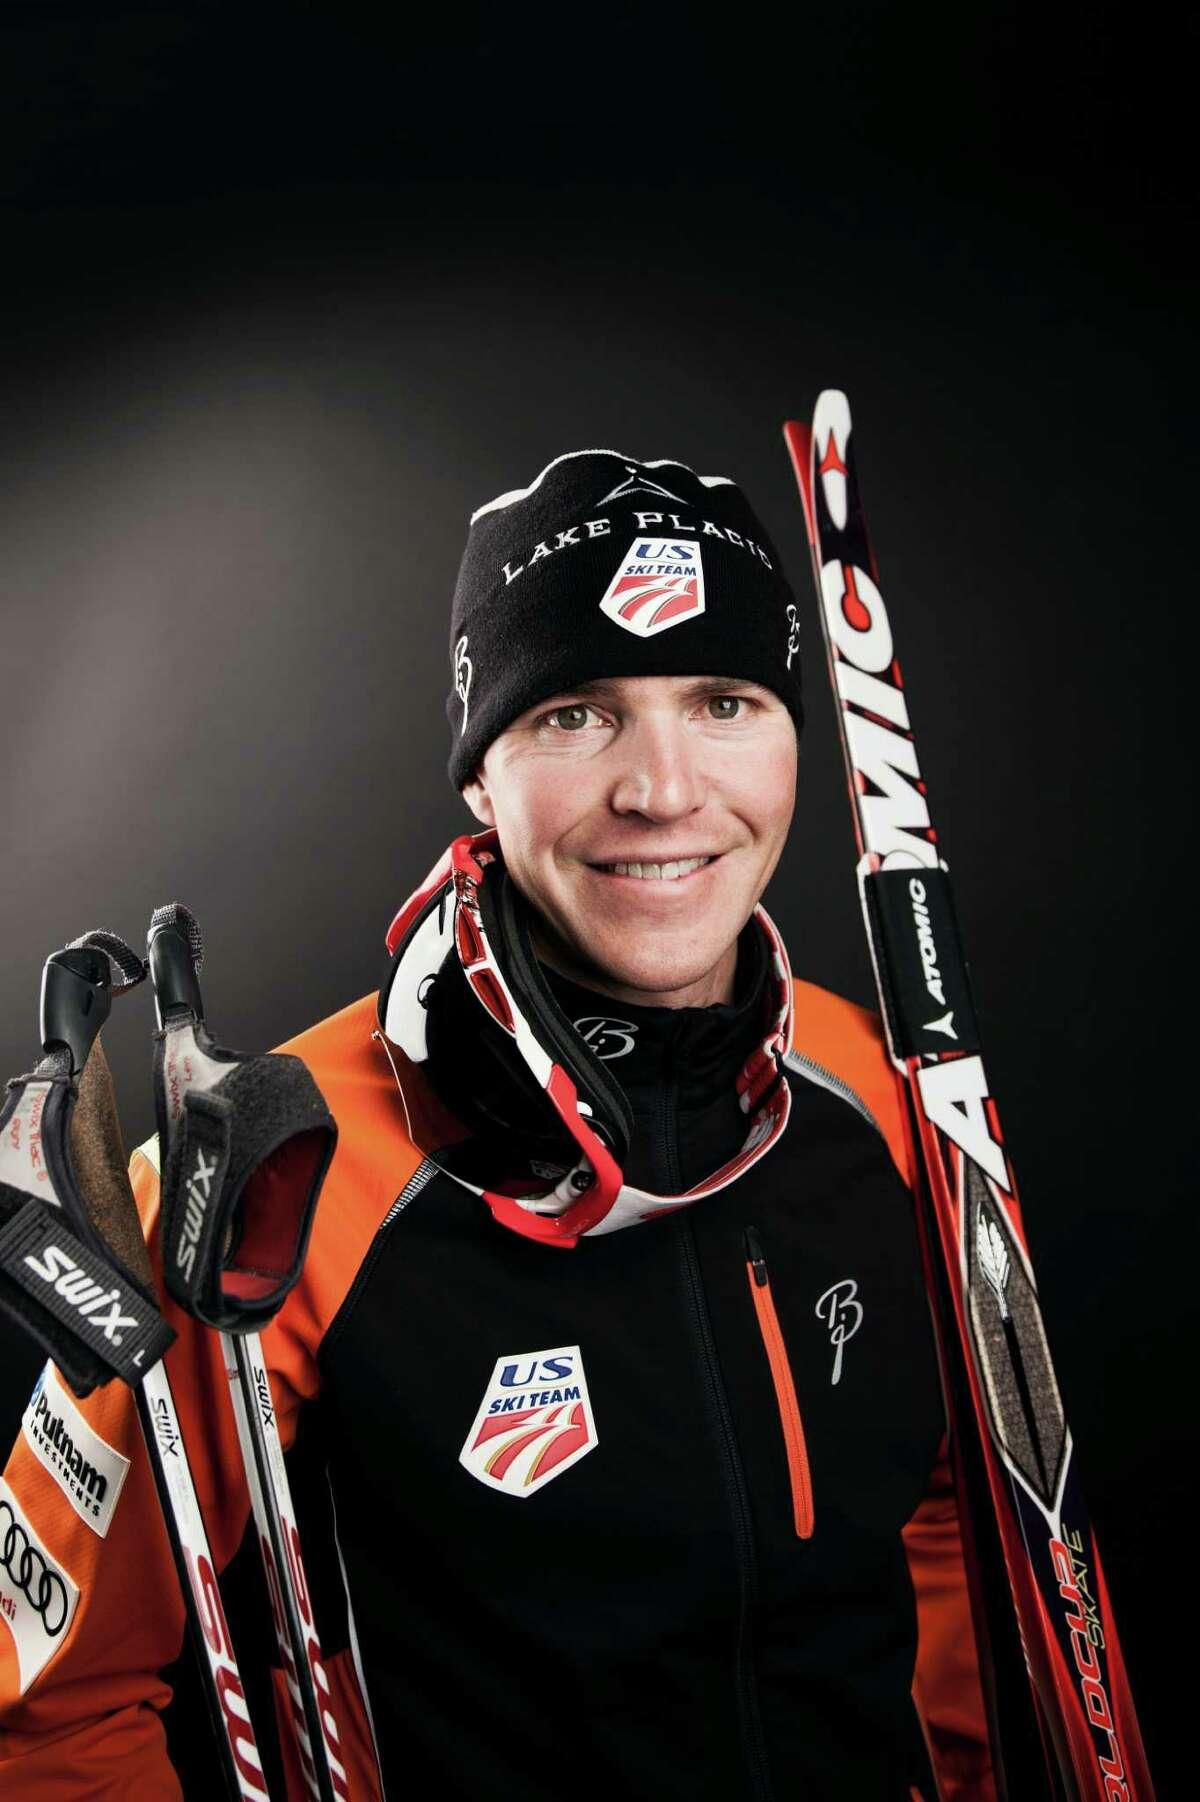 Billy Demong (Sarah Brunson/U.S. Ski Team)